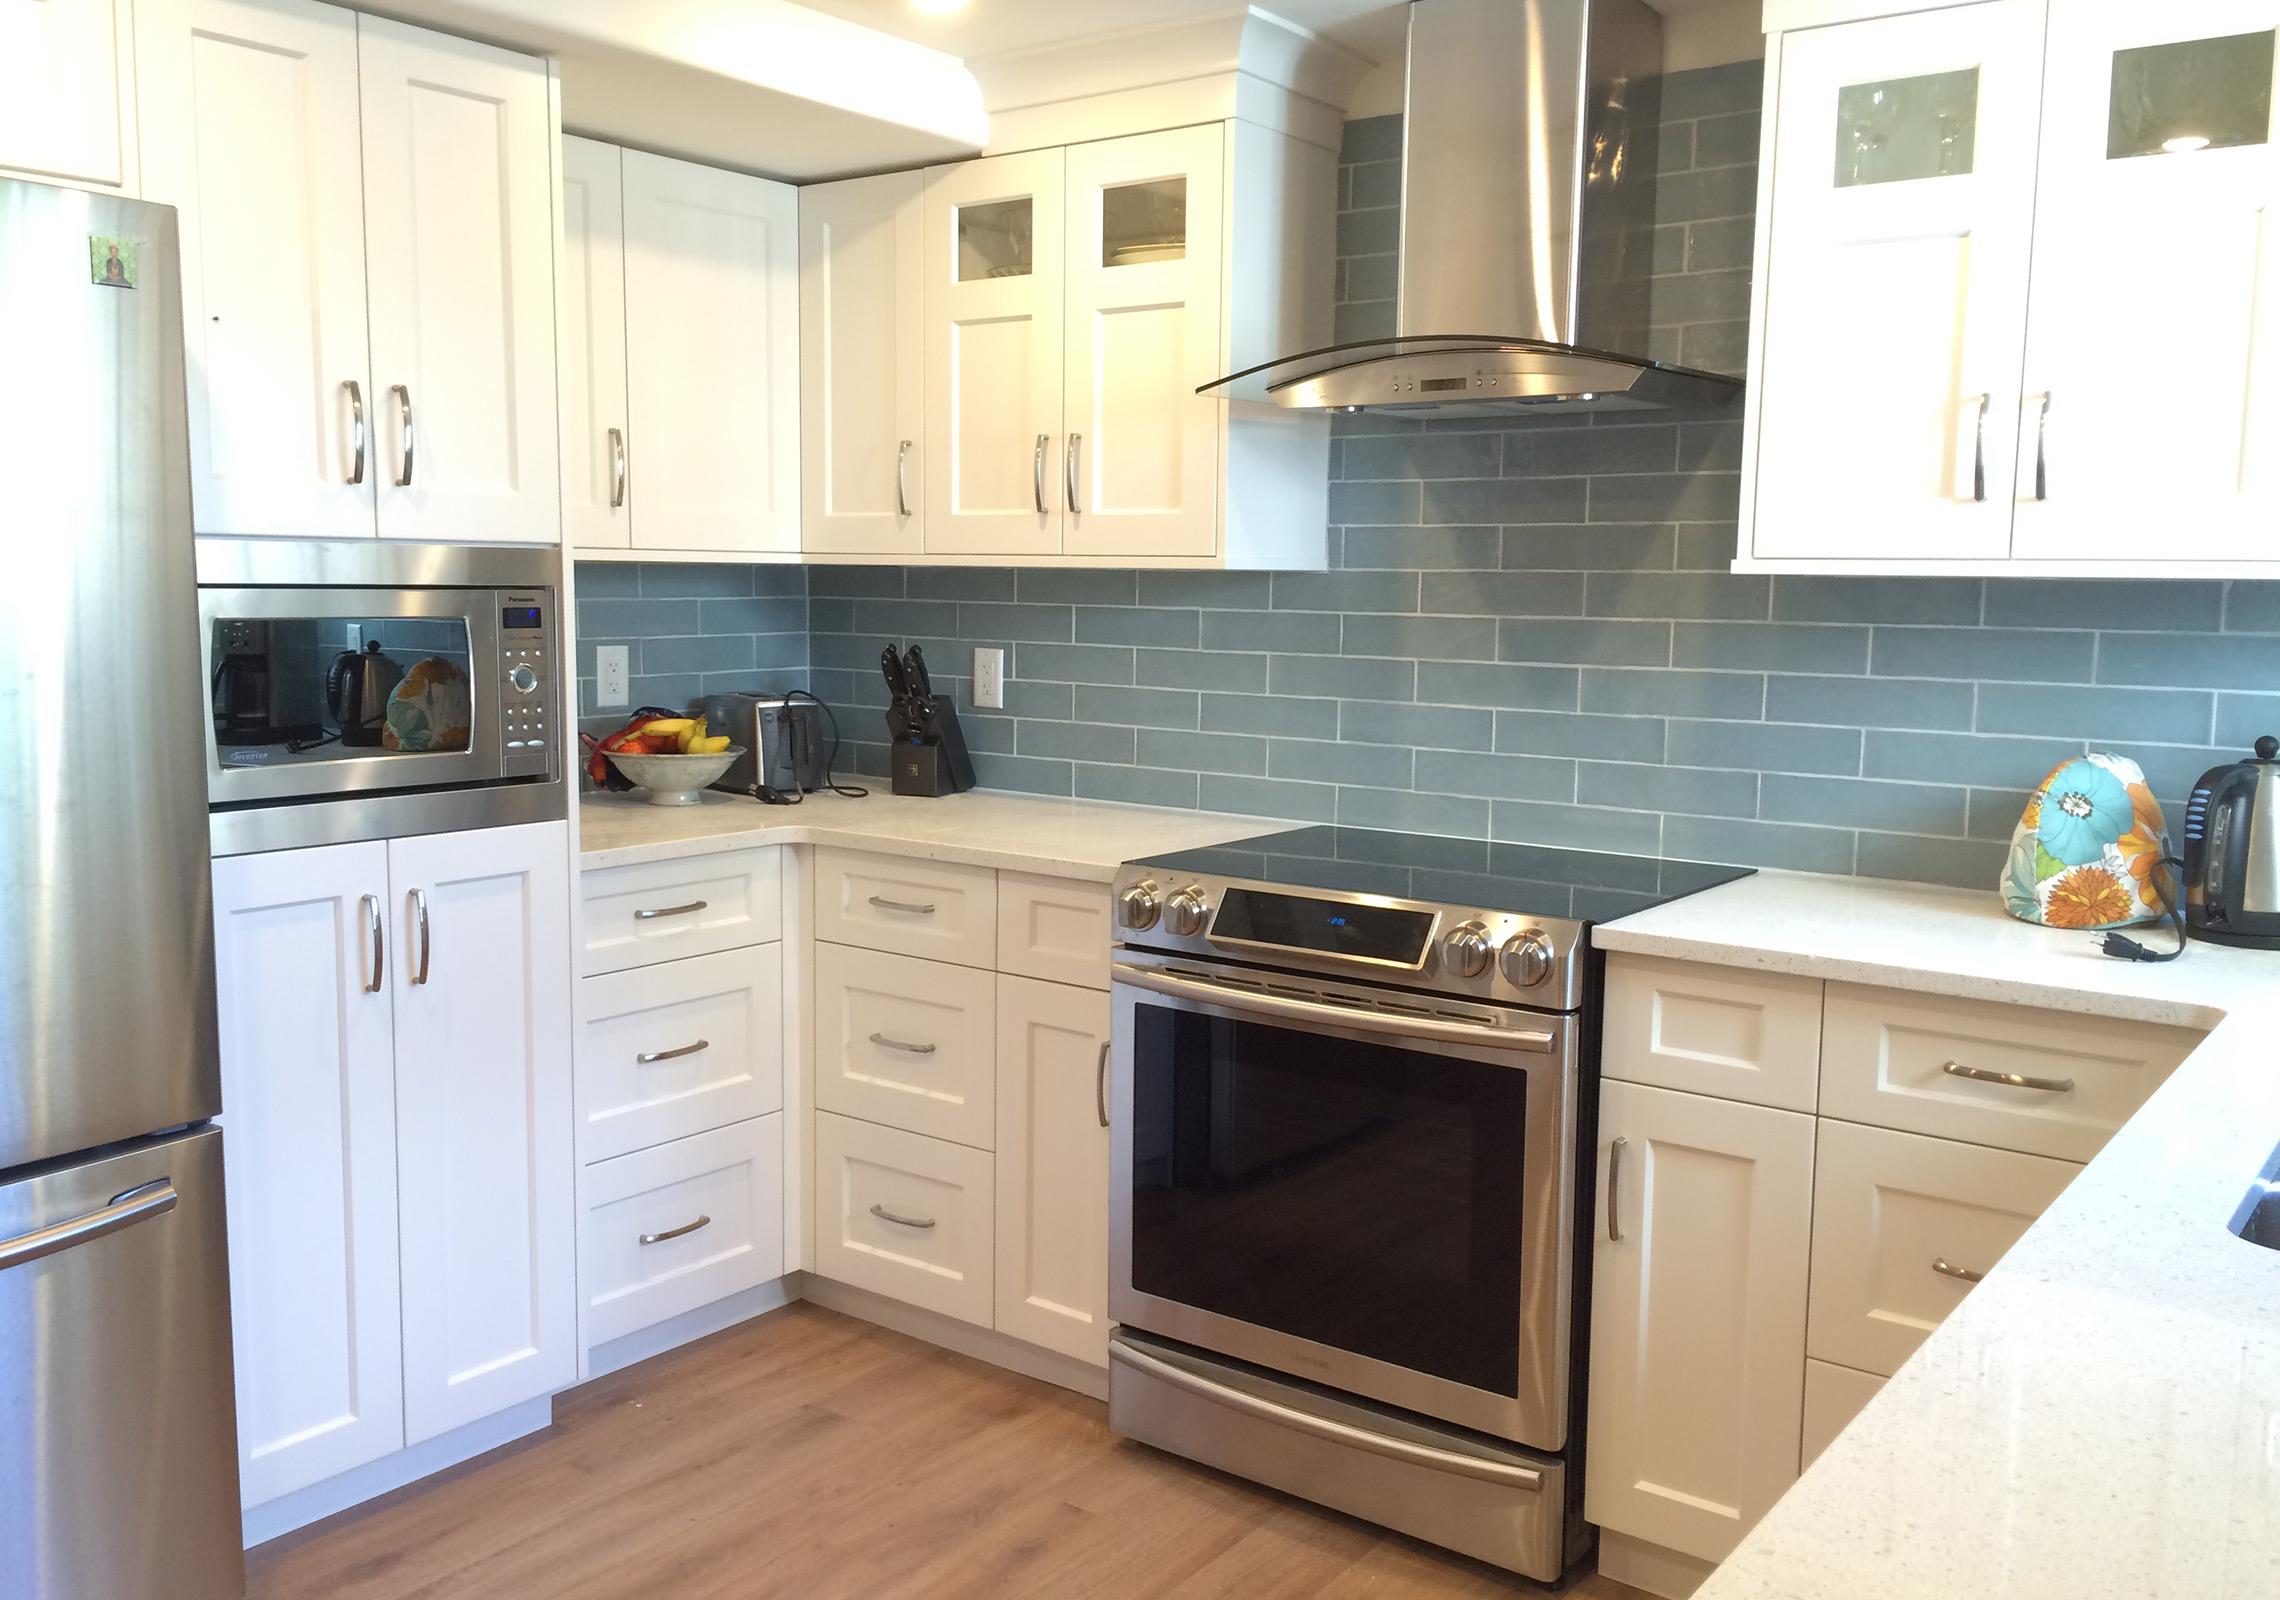 Kitchen Cabinets Port Coquitlam - Nagpurentrepreneurs